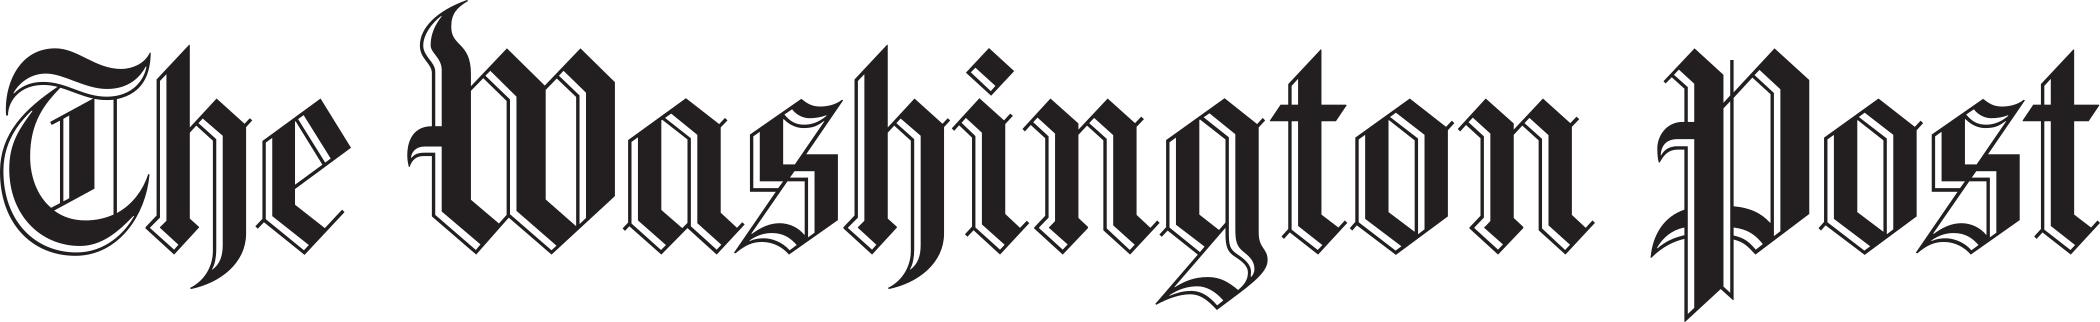 the washington post logo 1 - The Washington Post Logo